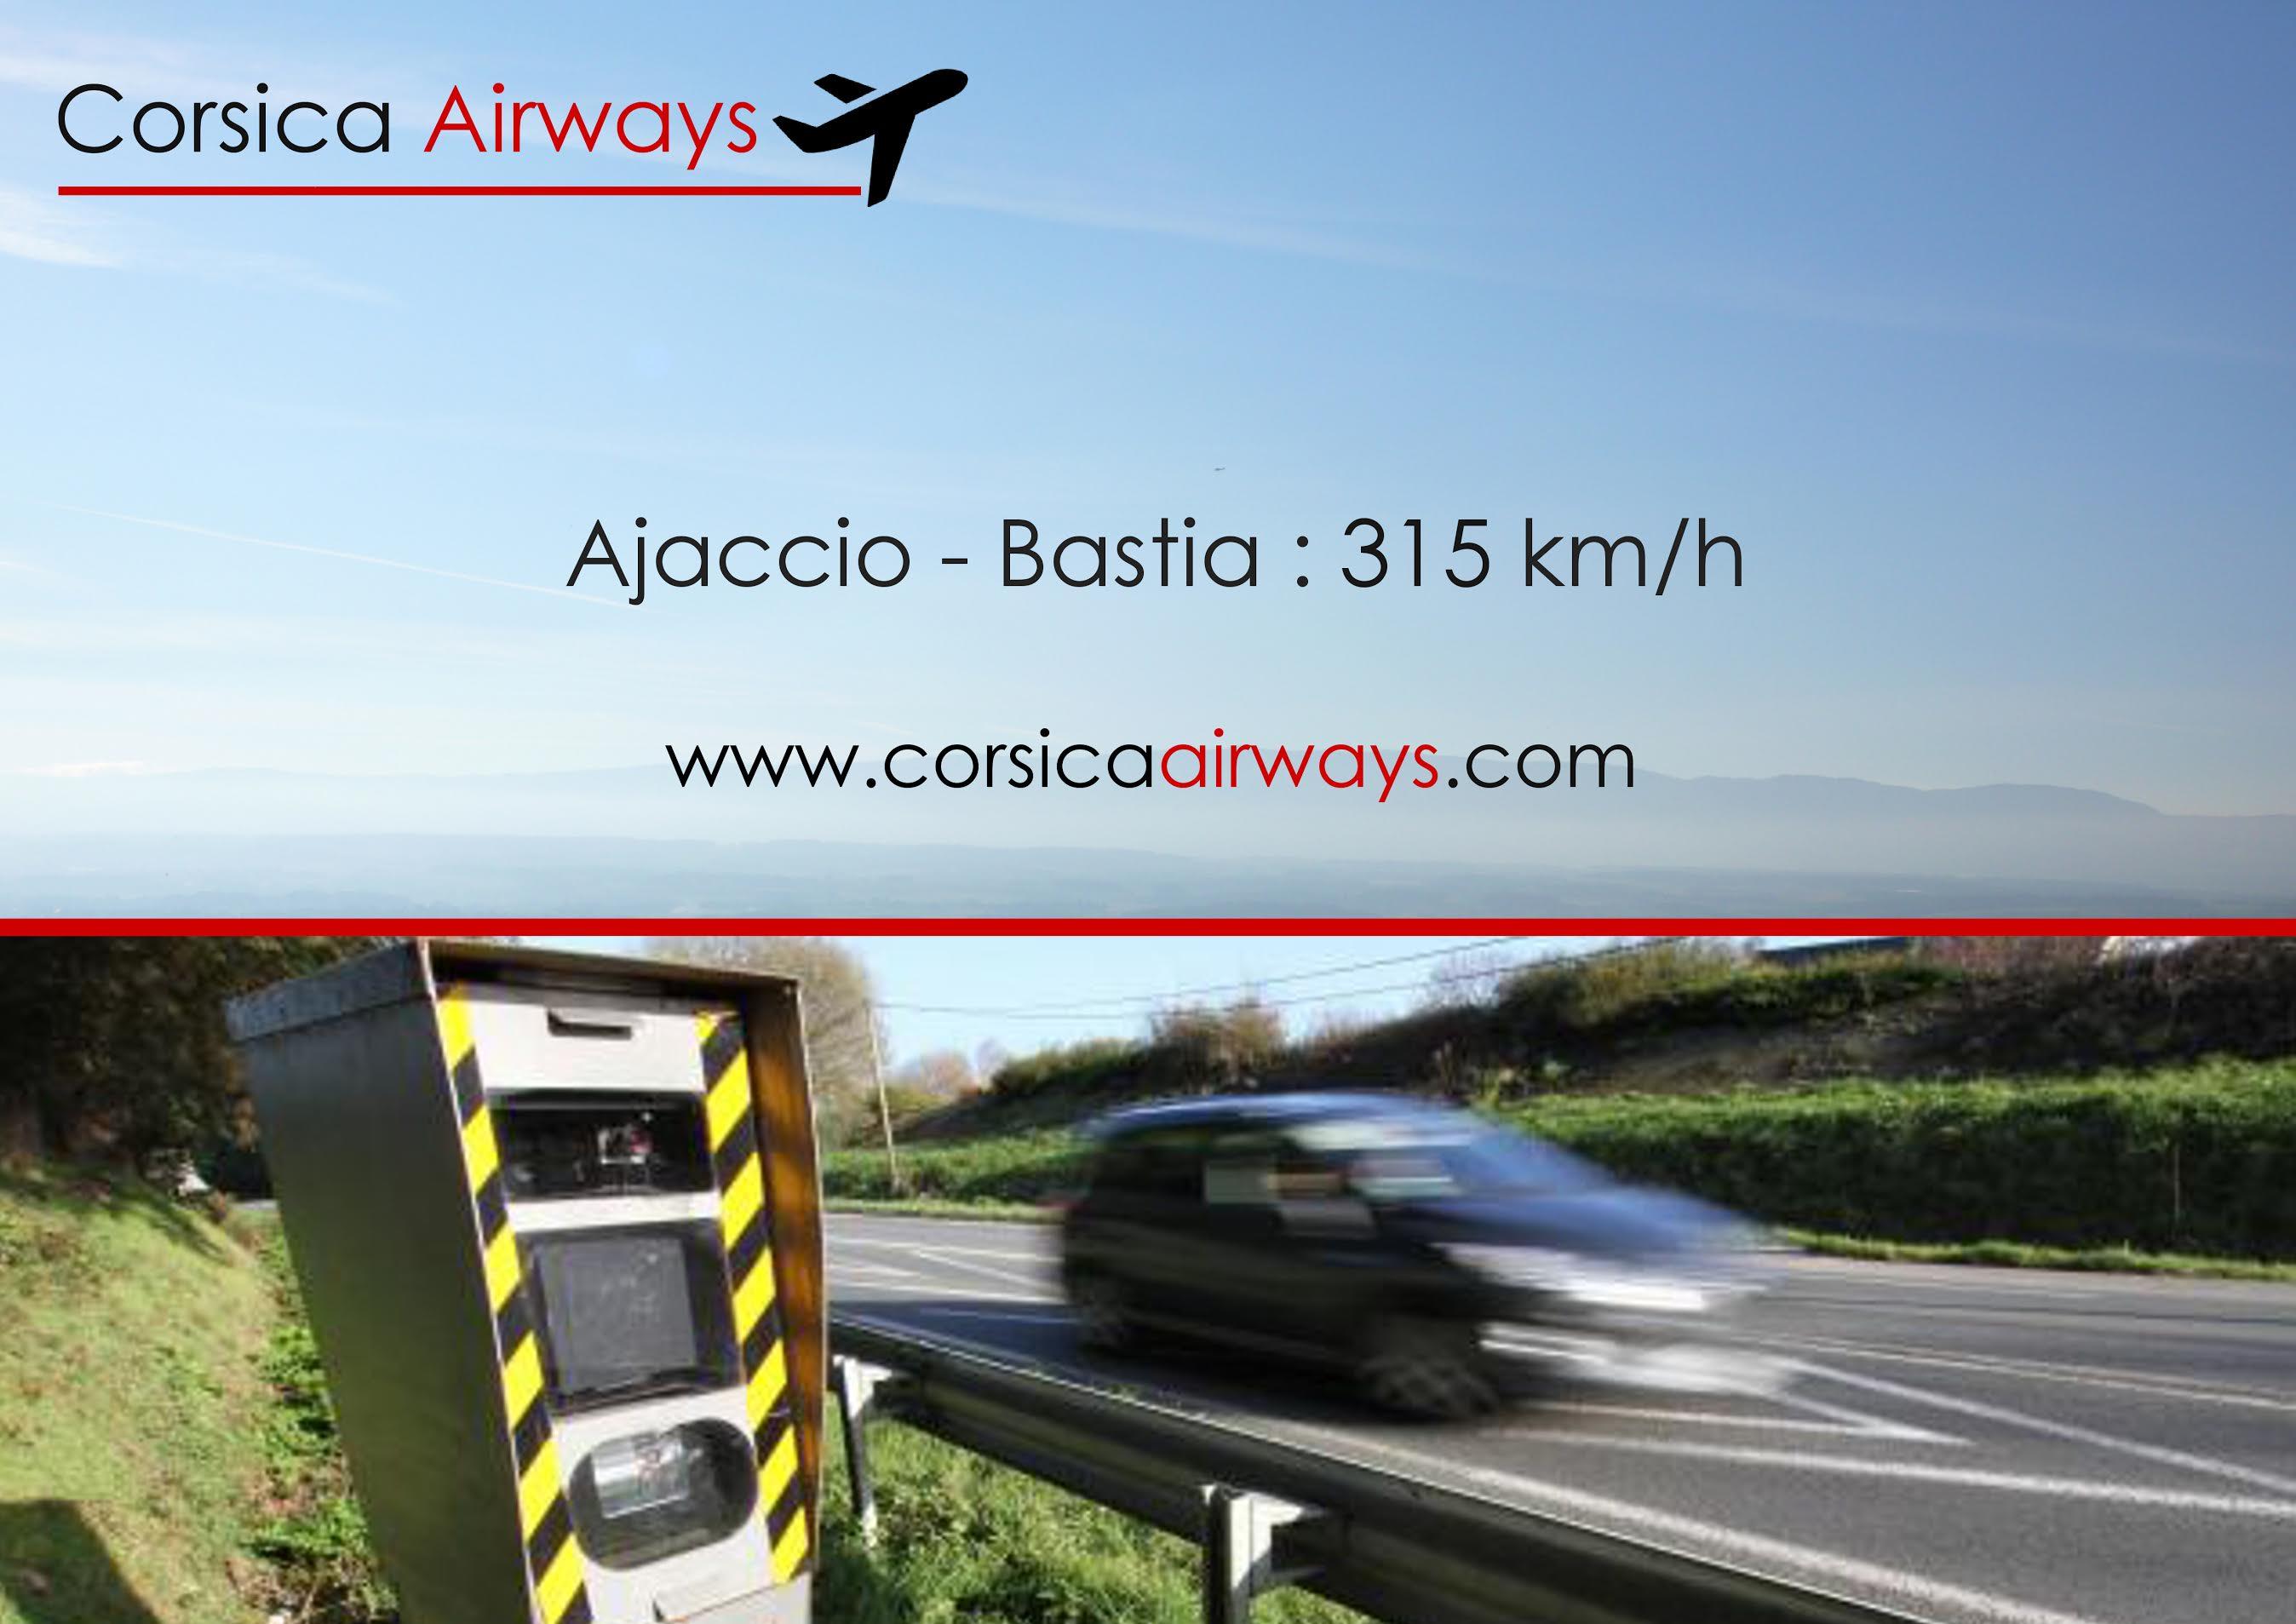 Corsica Airways